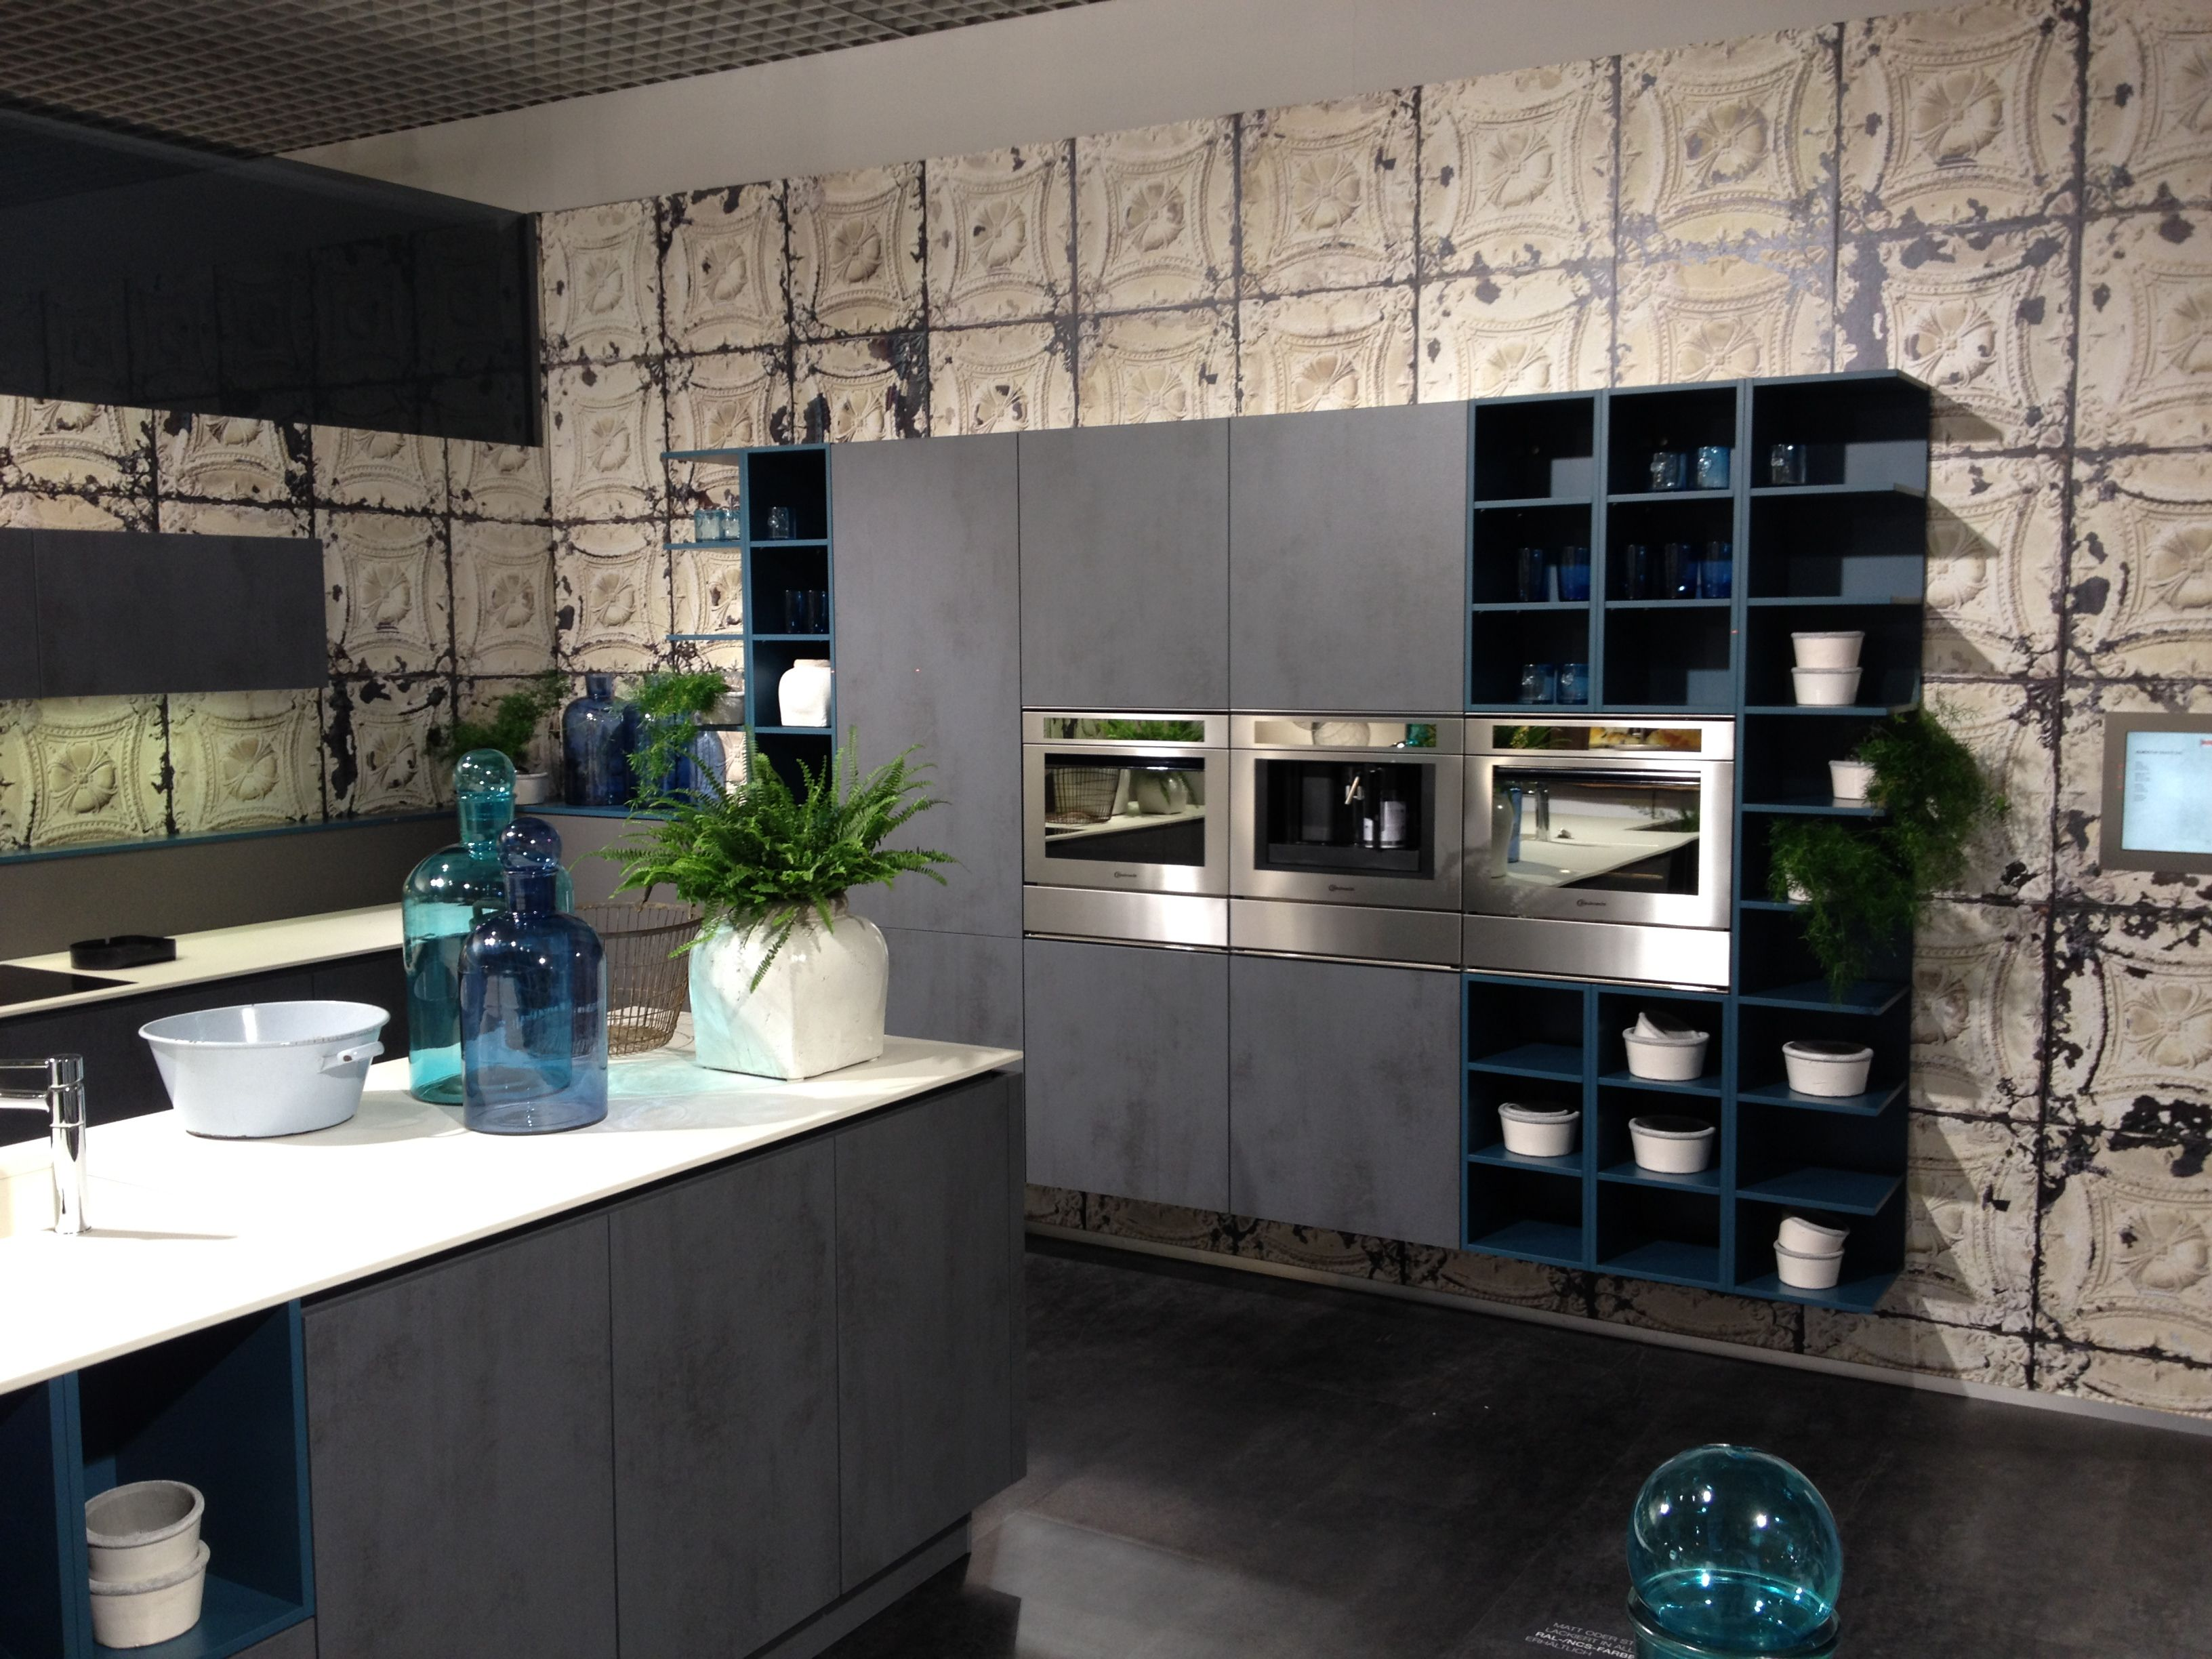 About alno modern kitchens on pinterest modern kitchen cabinets - Modern Alno Star Dur In Oxide Grey